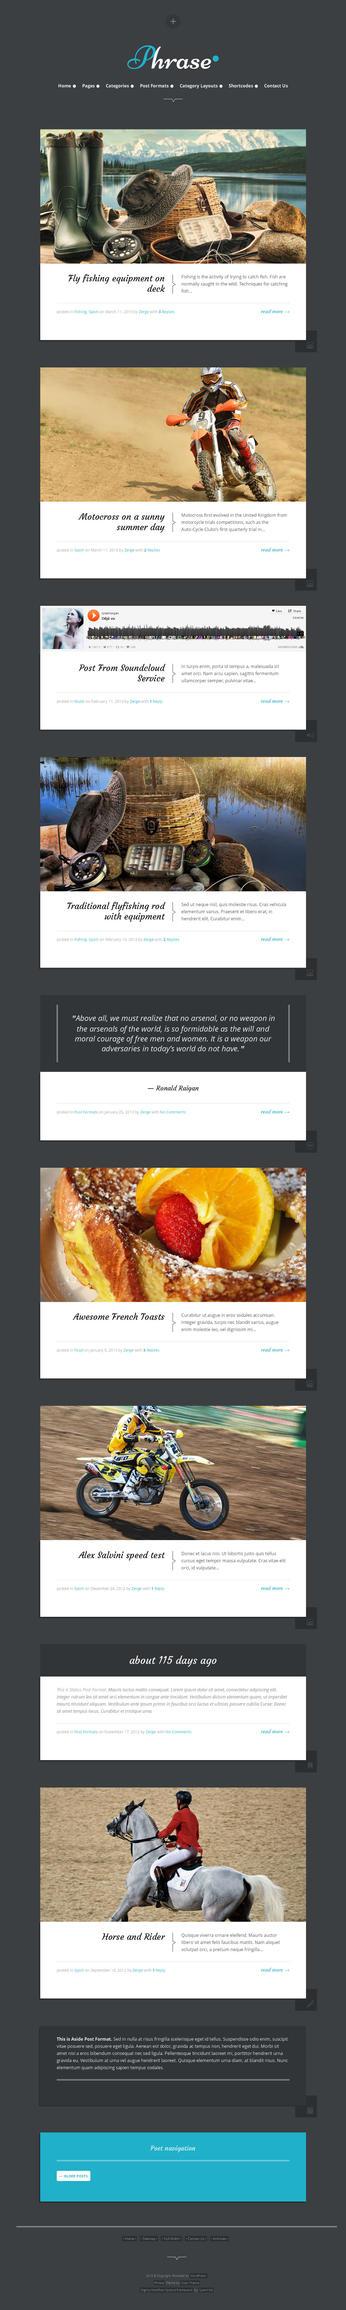 Phrase - Responsive WordPress Blog Theme by ZERGEV